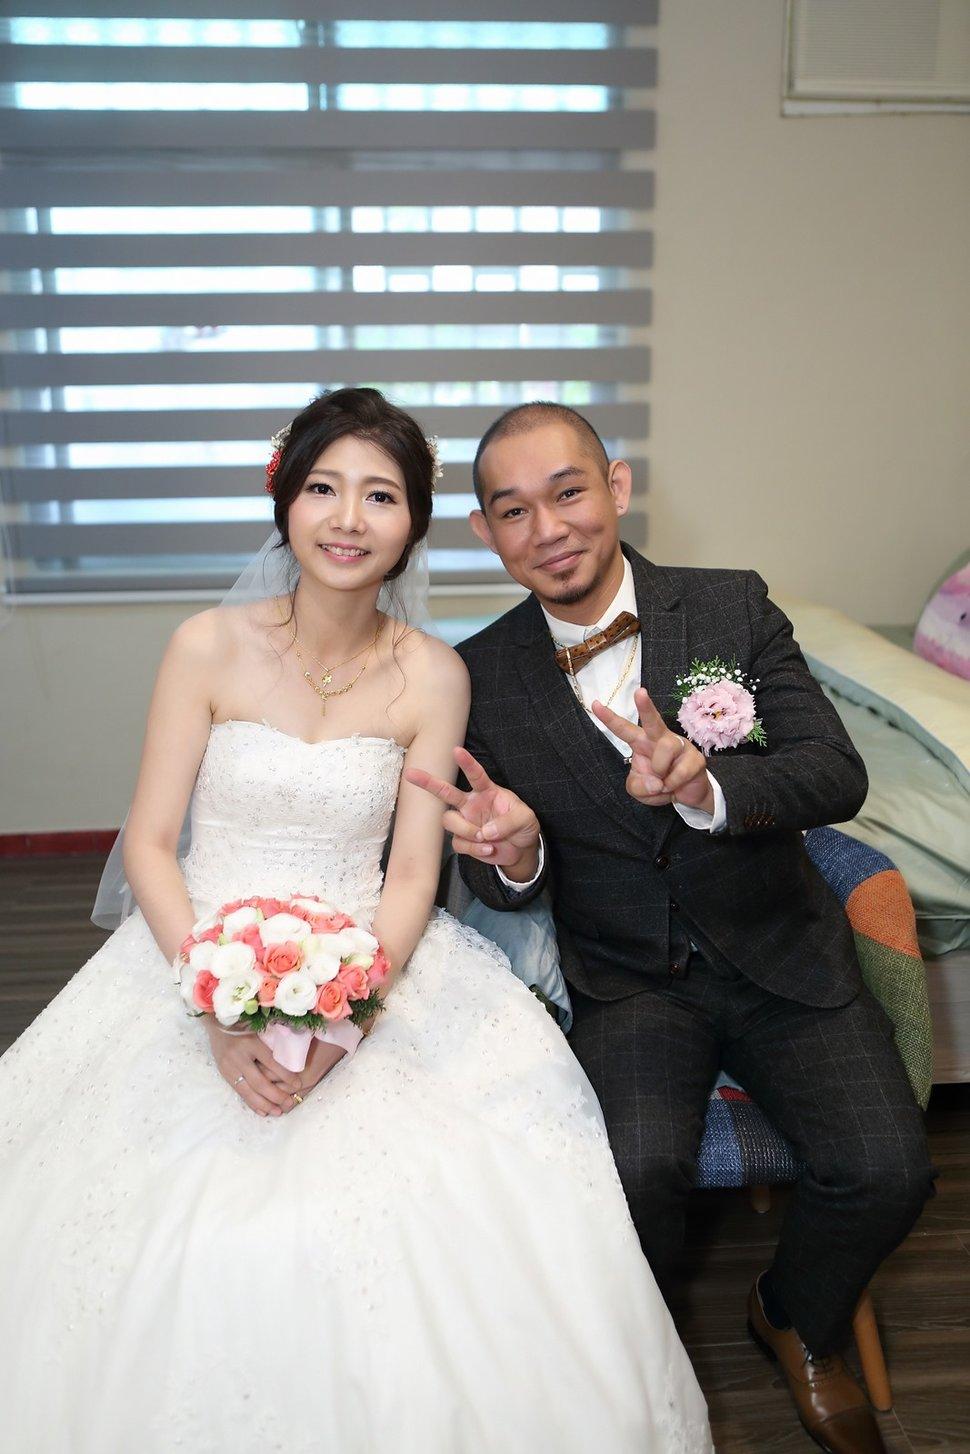 DPP_0522 - 頭頭-photo studio 專業攝影《結婚吧》